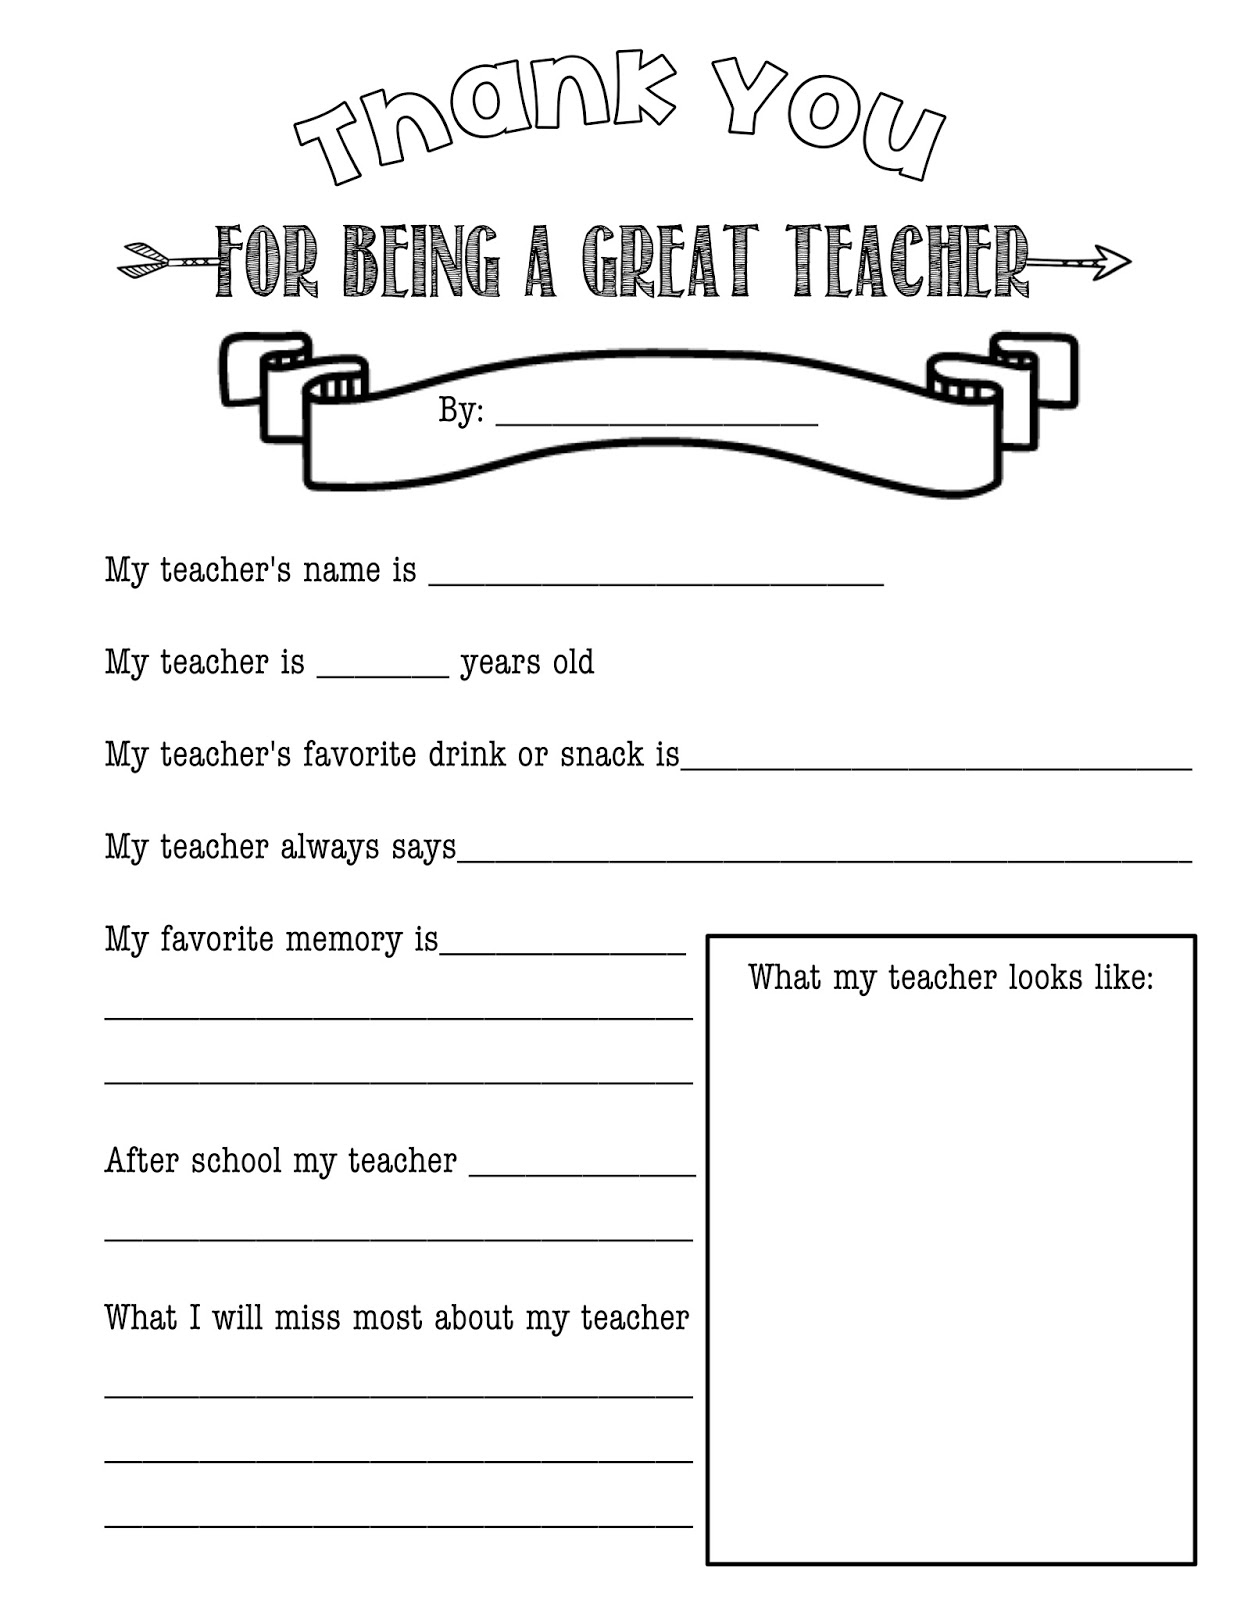 Free Teacher Questionnaire